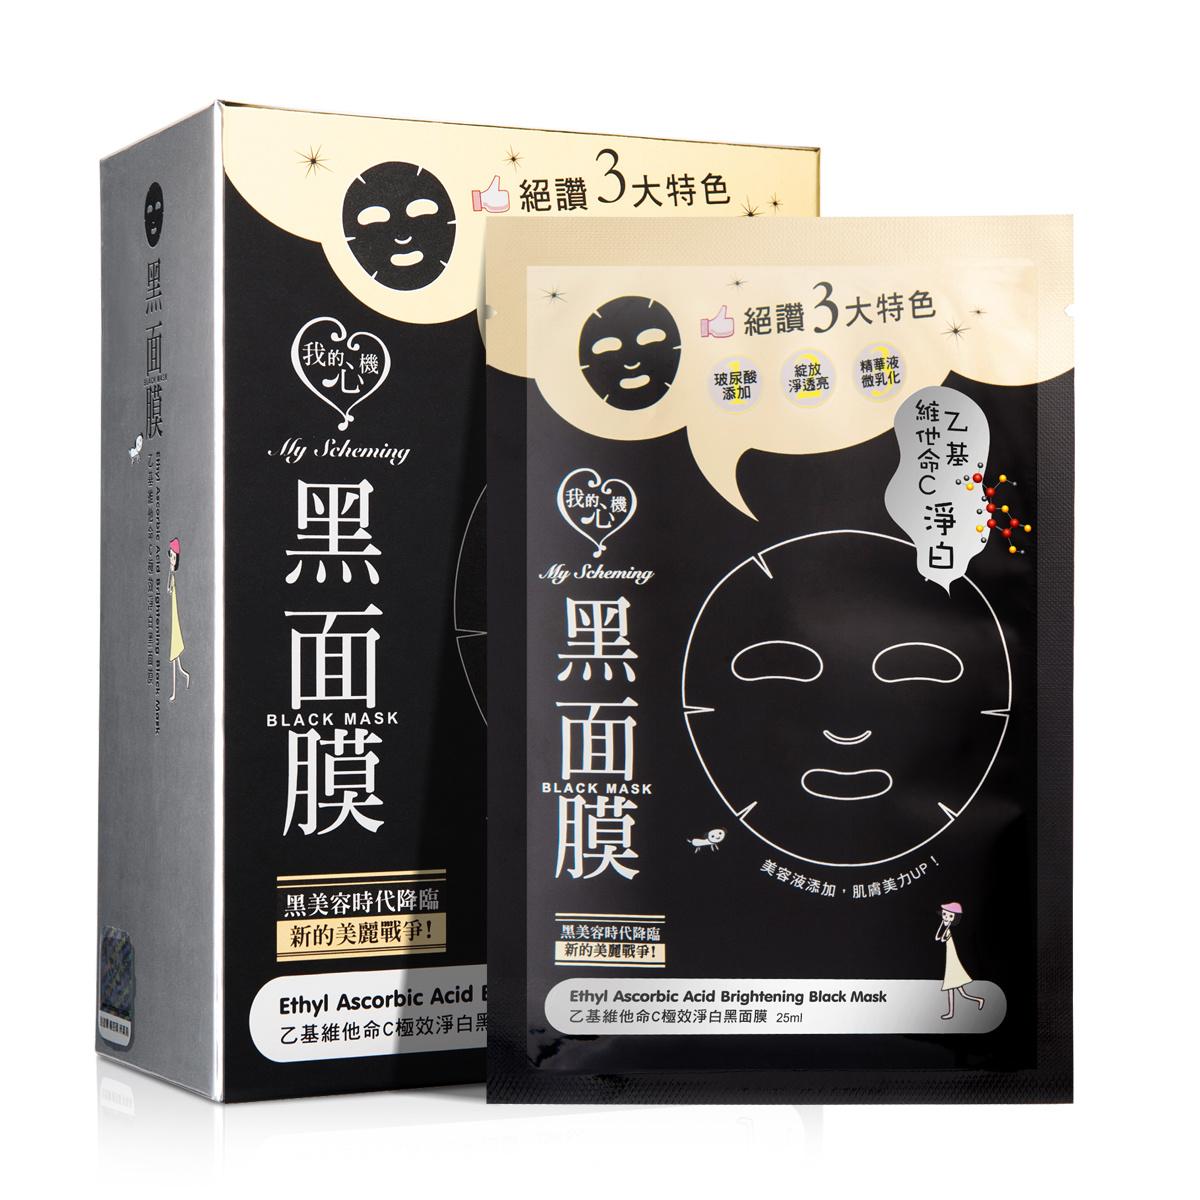 Ethyl Ascorbic Acid Brightening Black Mask (8 pcs)-1